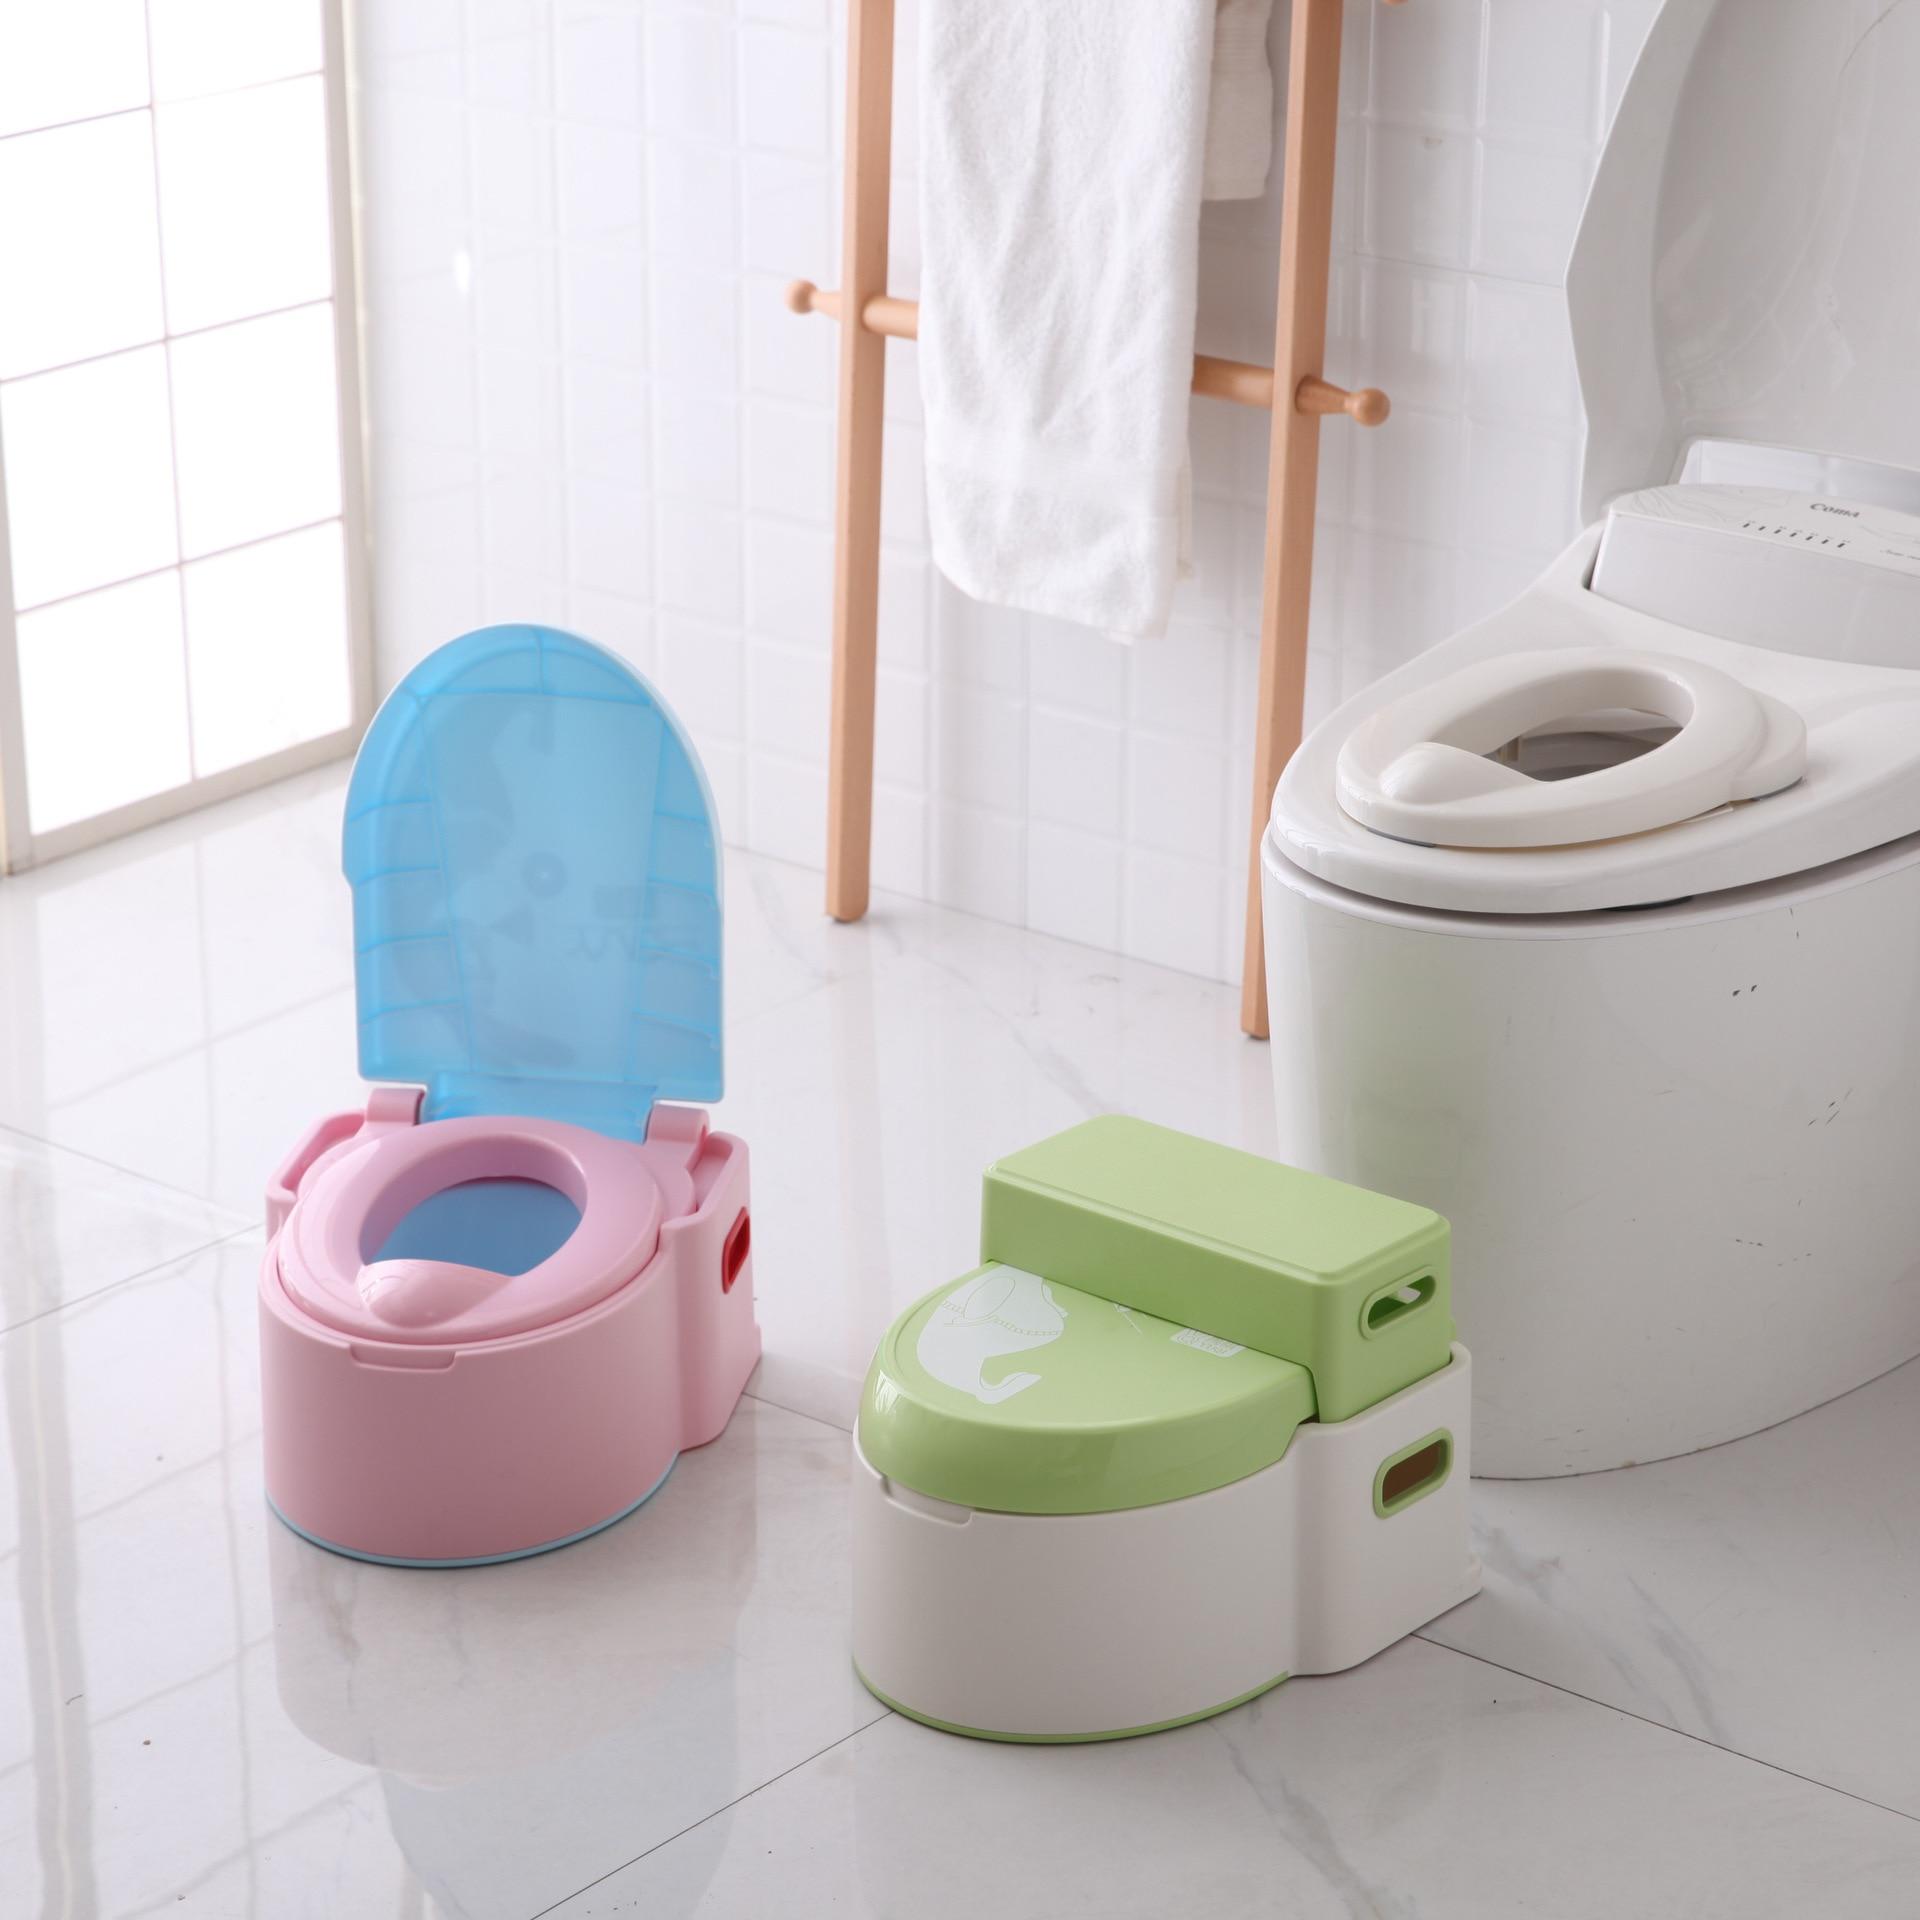 Yu Qb Bao Toilet For Kids Women's Toilet Infants Men's Potty Urinal Infant Kids Small Chamber Pot